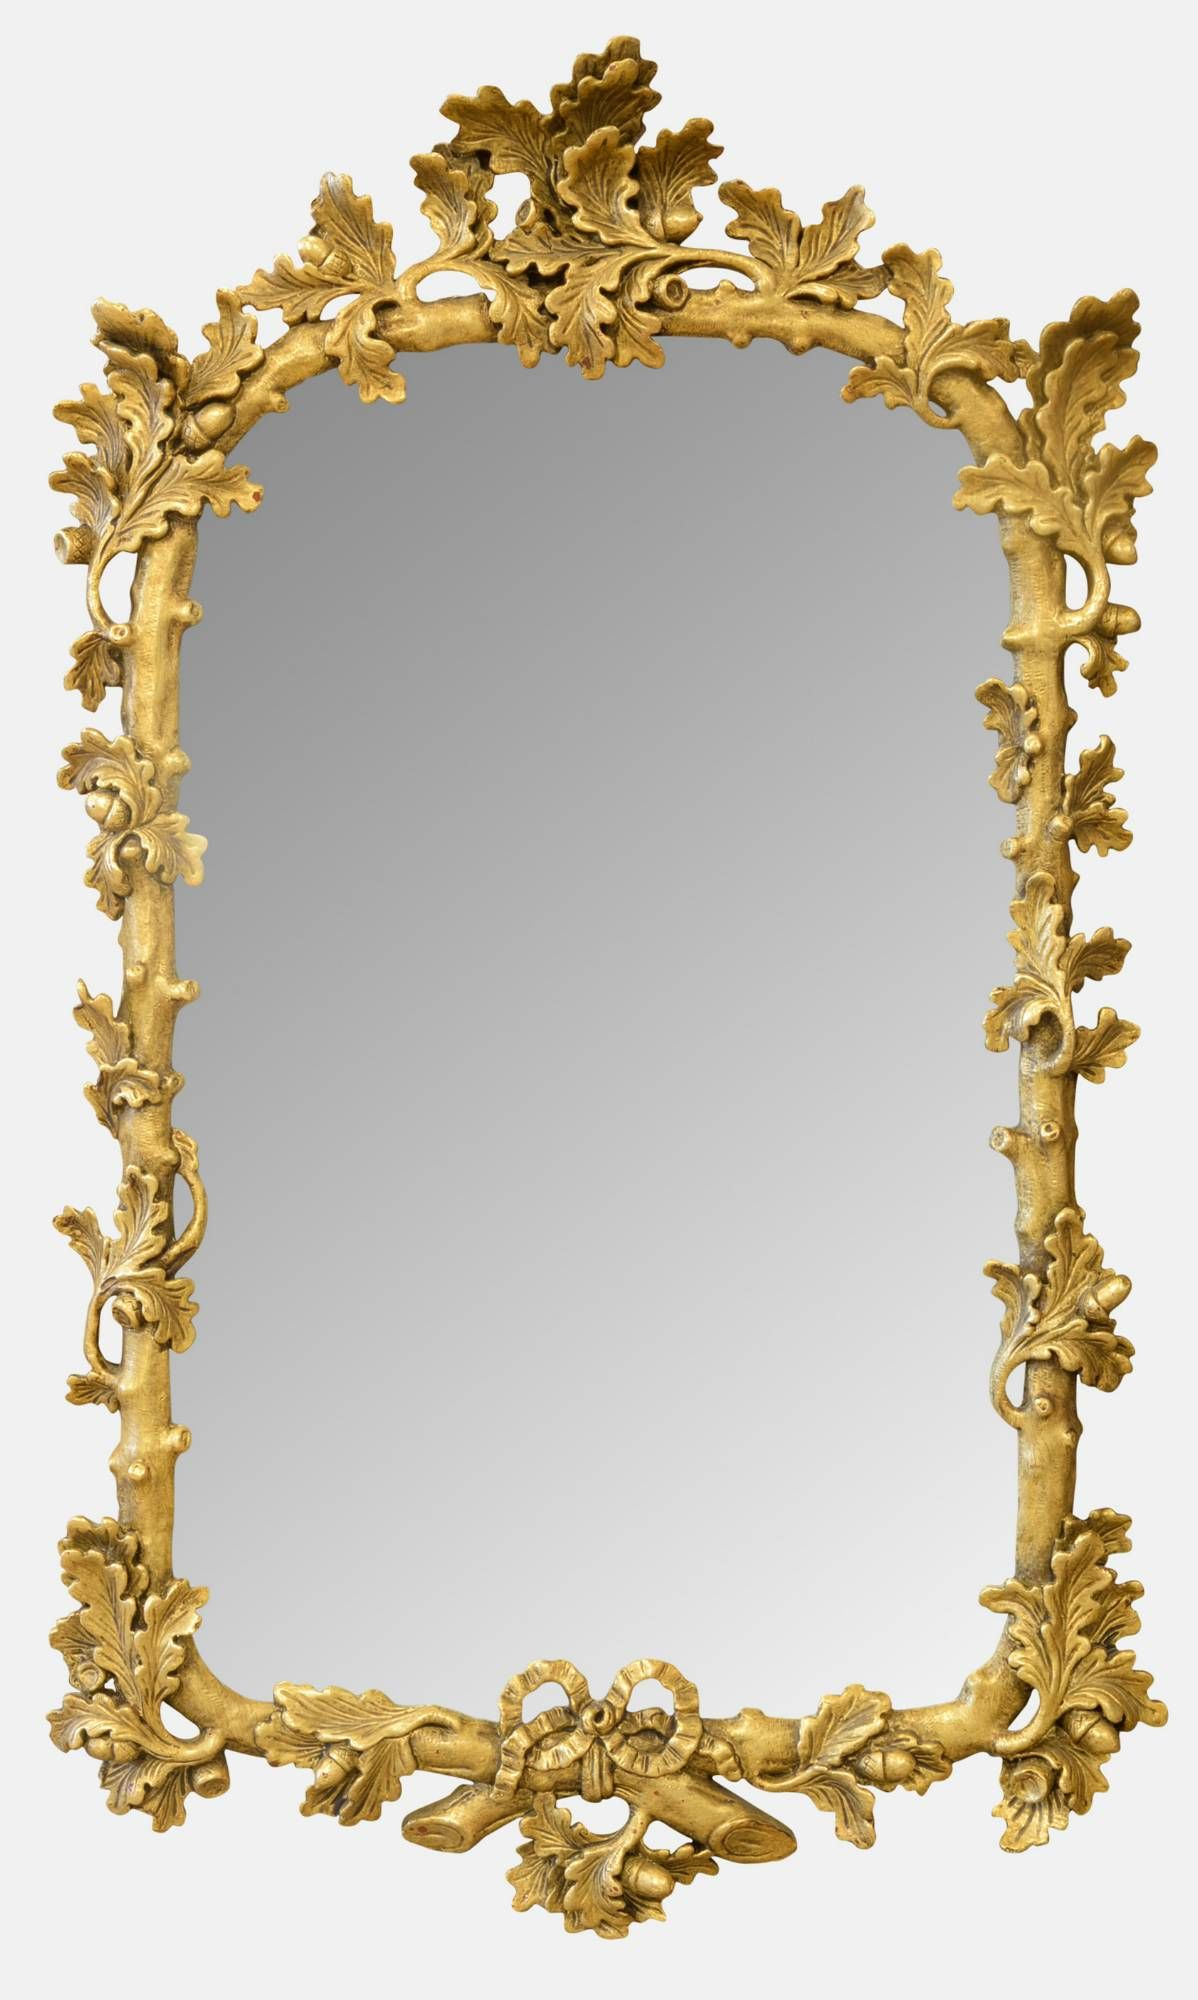 Gilded Mirror with Oak Leaf Border - | LoveAntiques.com | Mirror ...